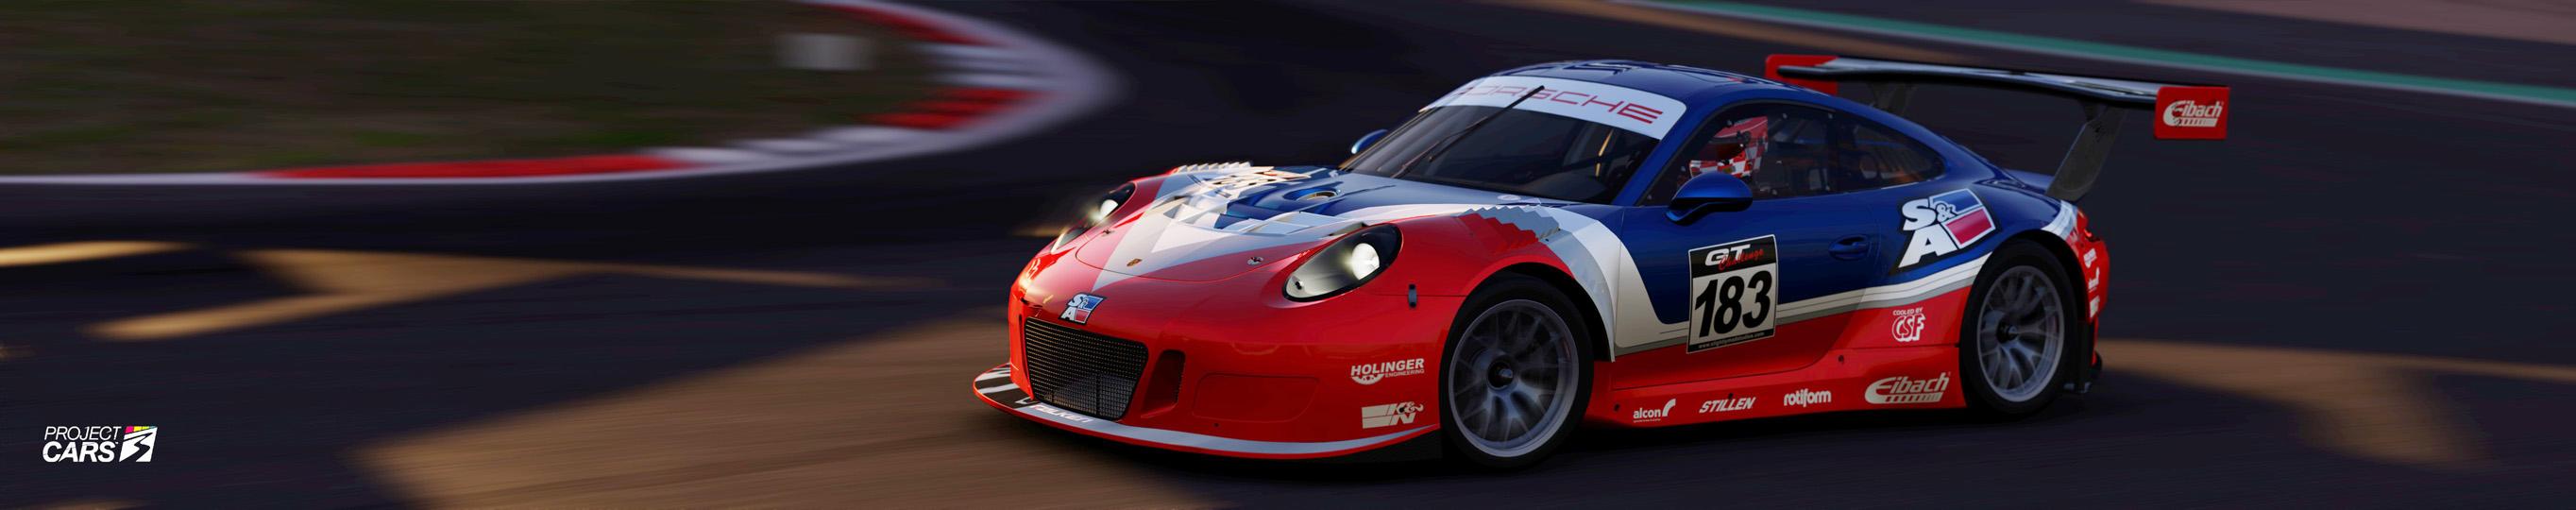 0 PROJECT CARS 3 PORSCHE 911 GT3 R at NURBURGRING crop copy.jpg